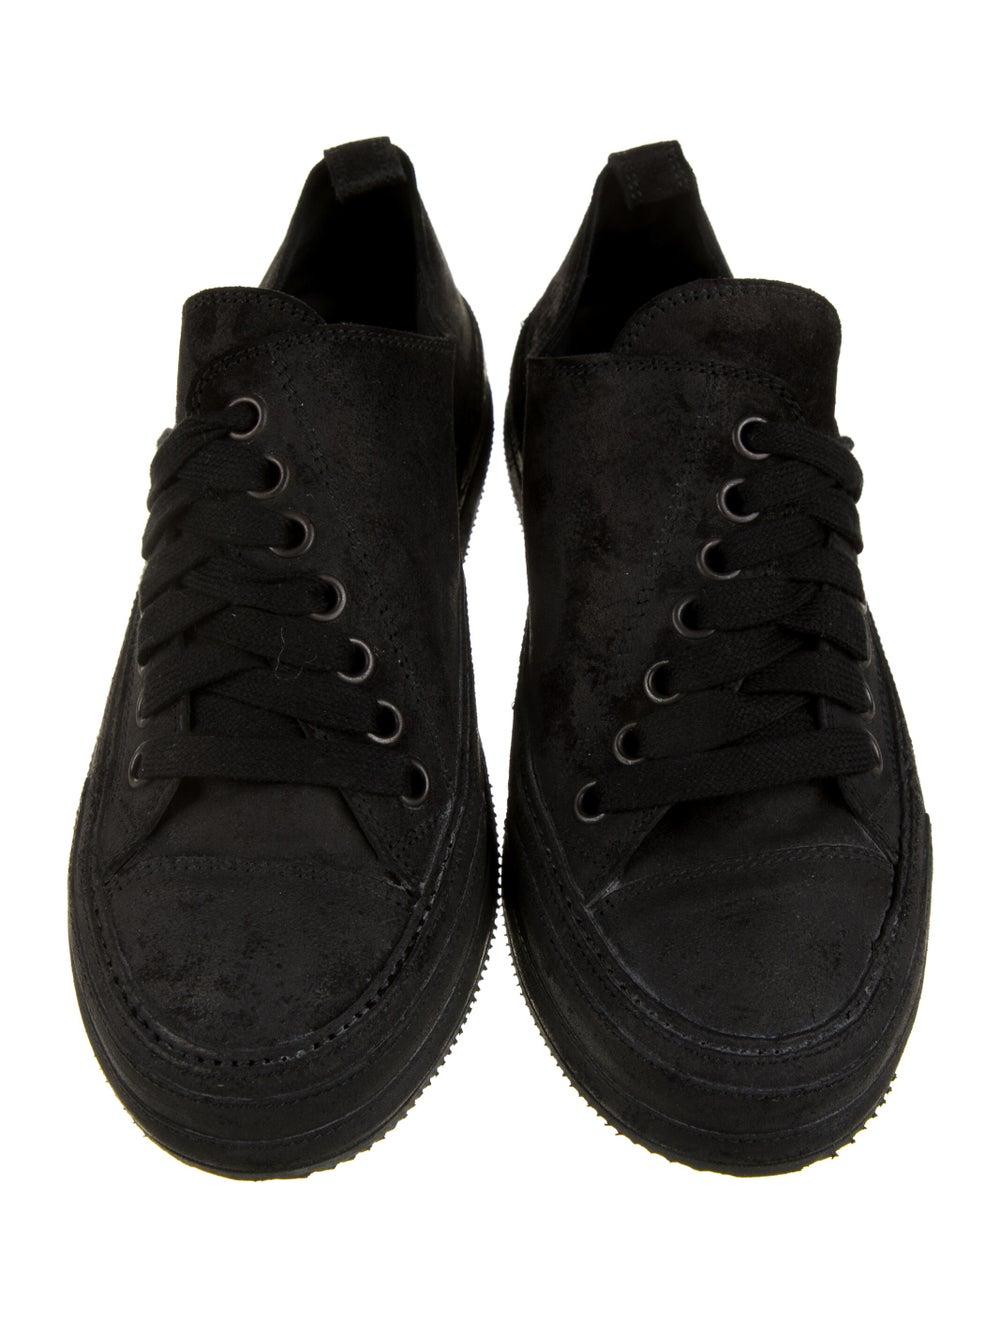 Ann Demeulemeester Suede Sneakers Black - image 3